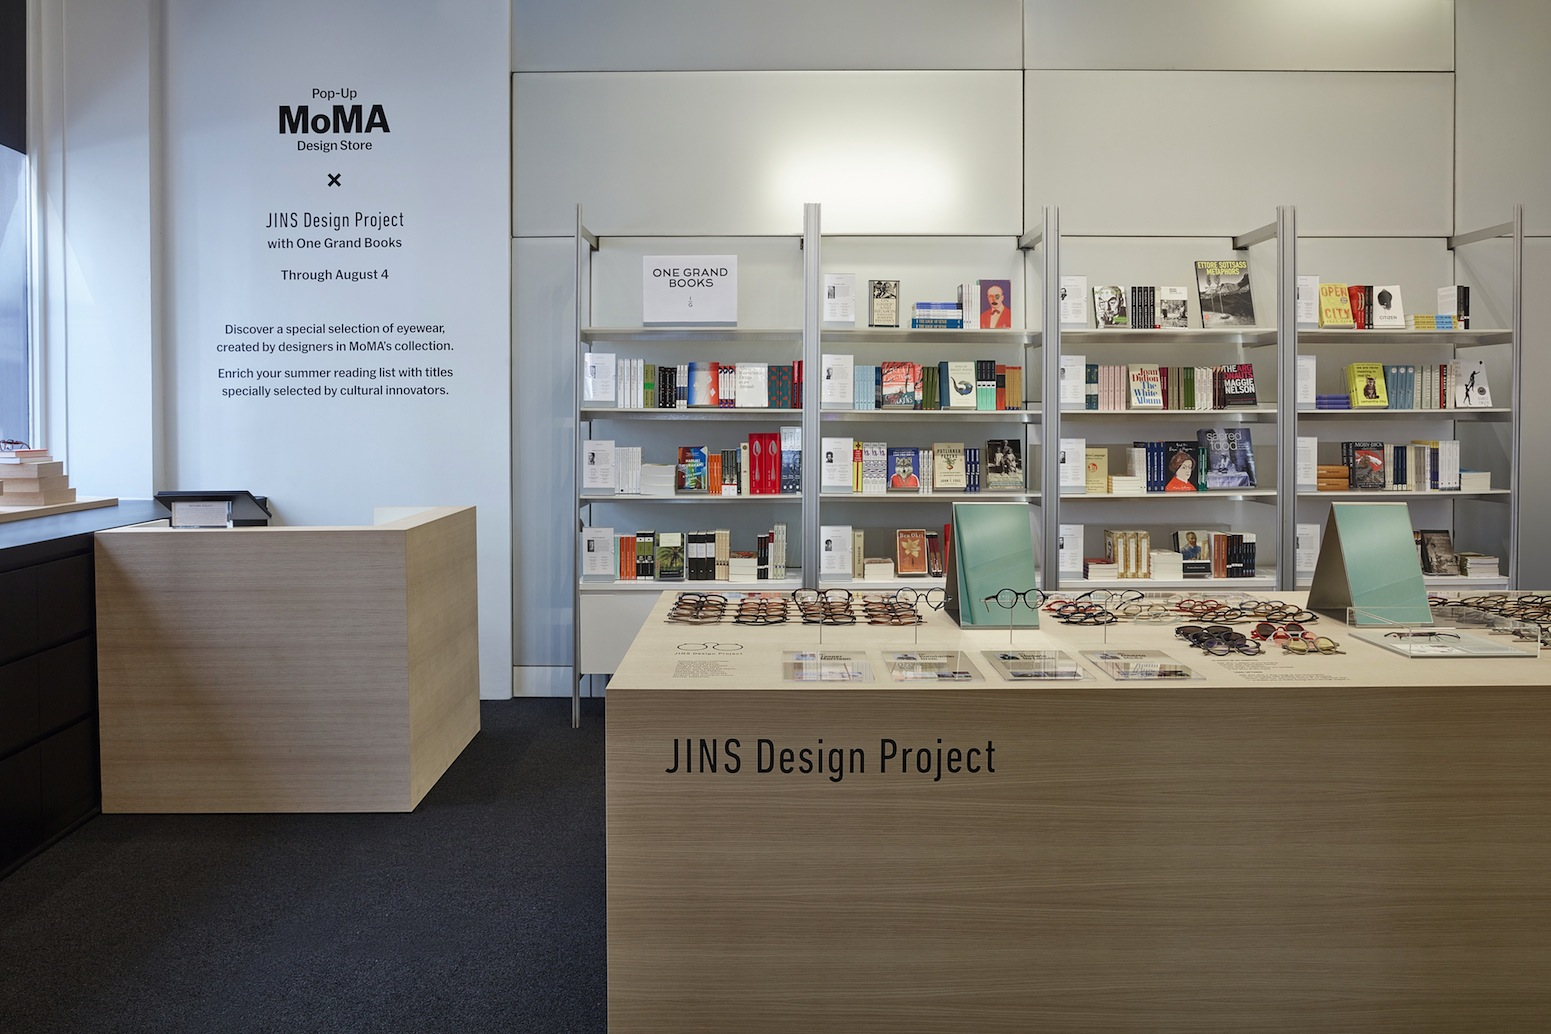 JINSがニューヨーク初進出<br>MoMA公式ショップに期間限定店